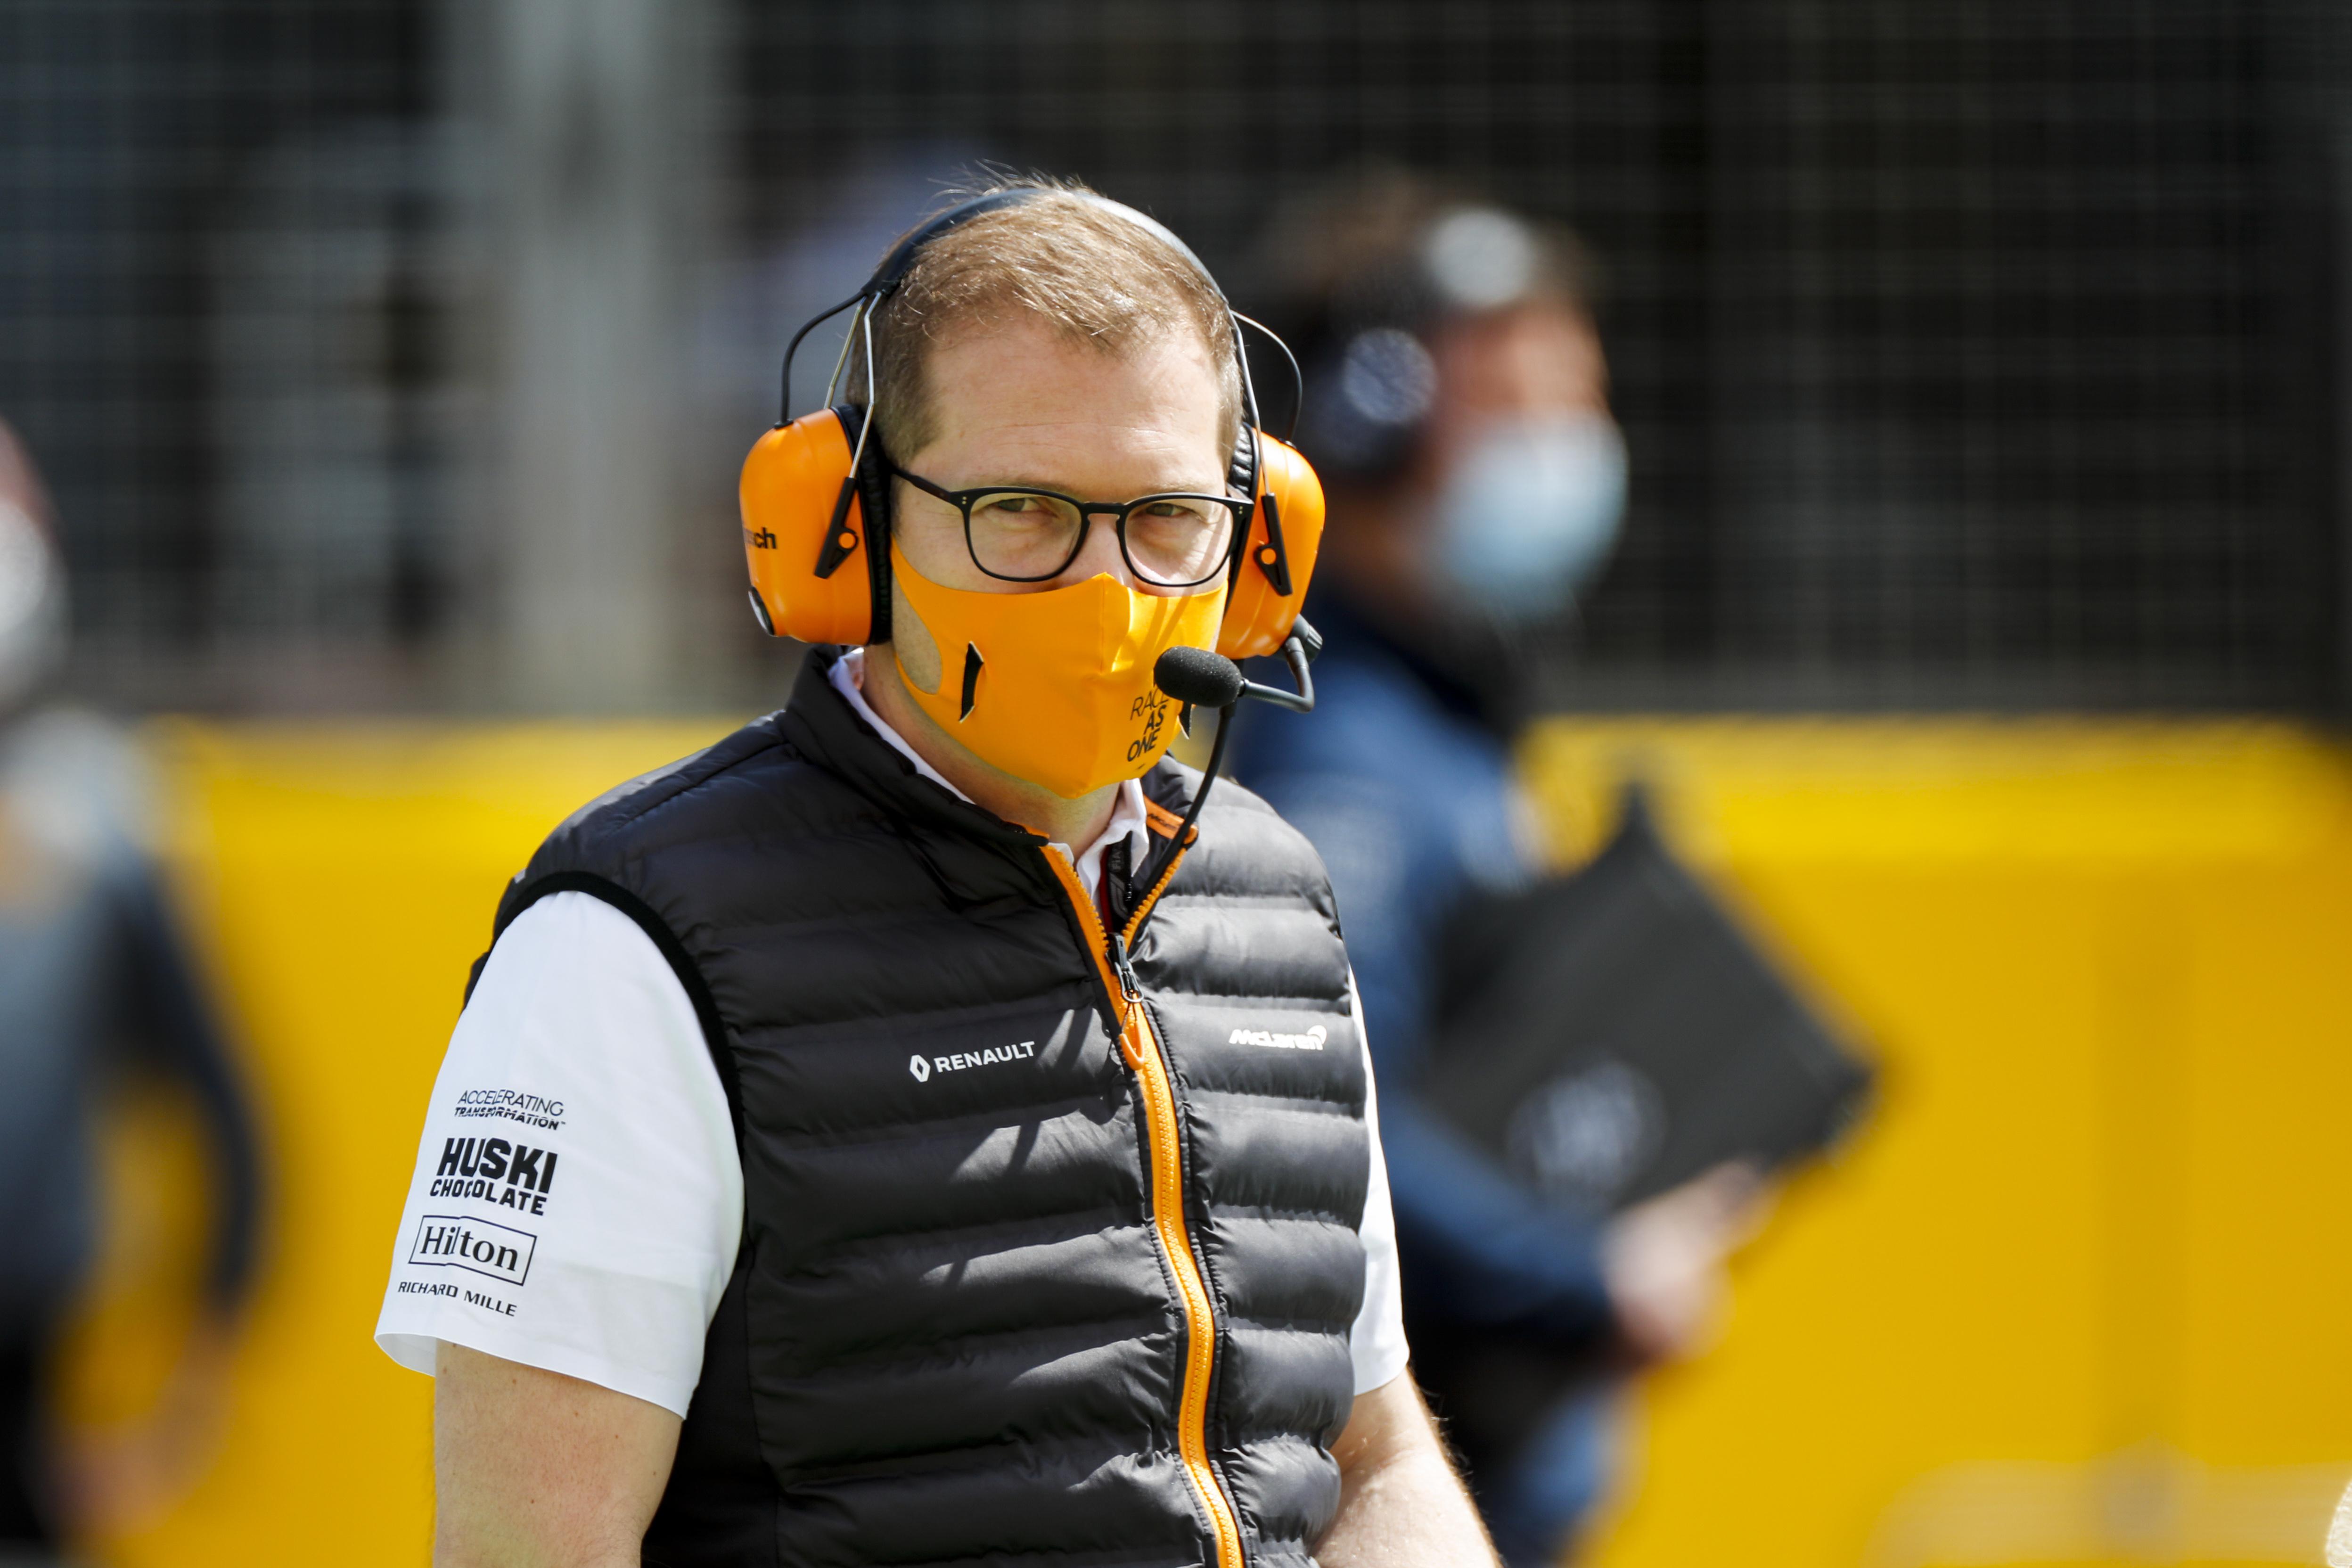 Andreas Seidl McLaren F1 Silverstone 2020